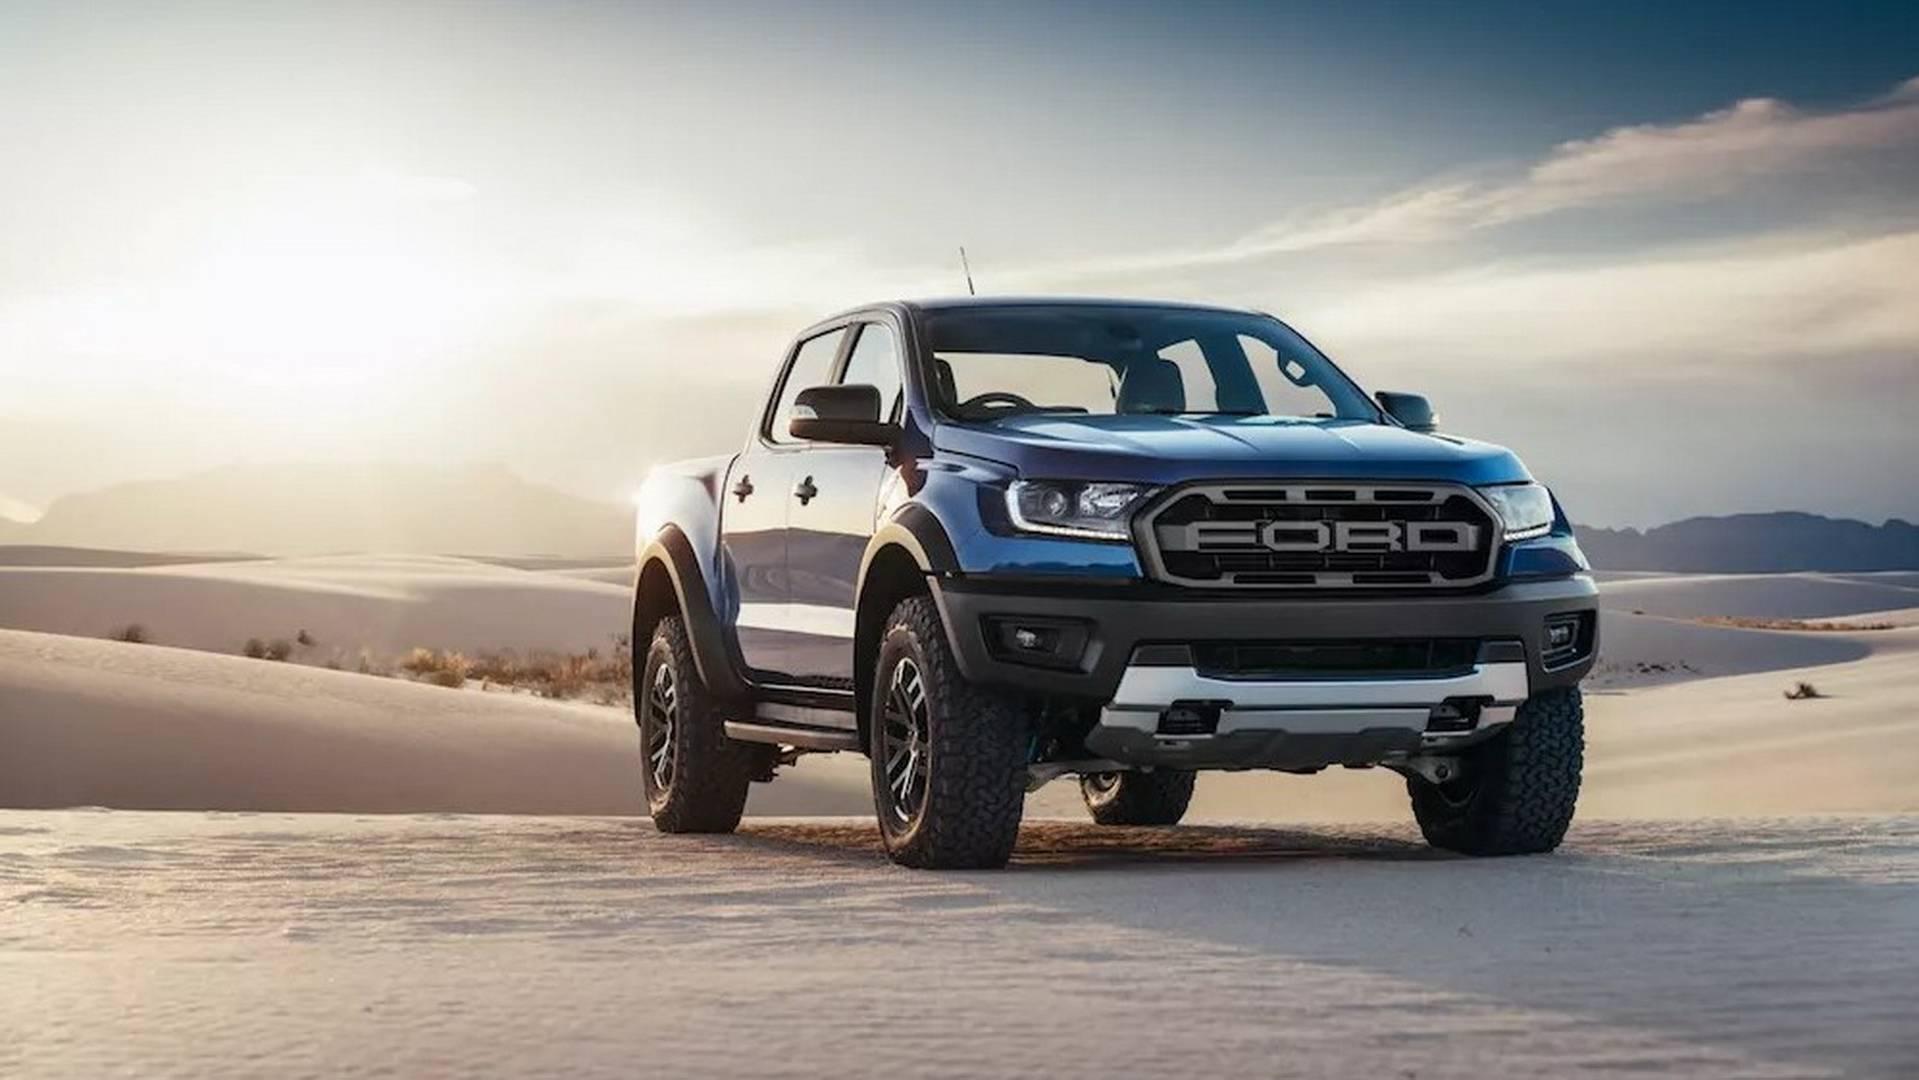 2019 Ford Ranger preview